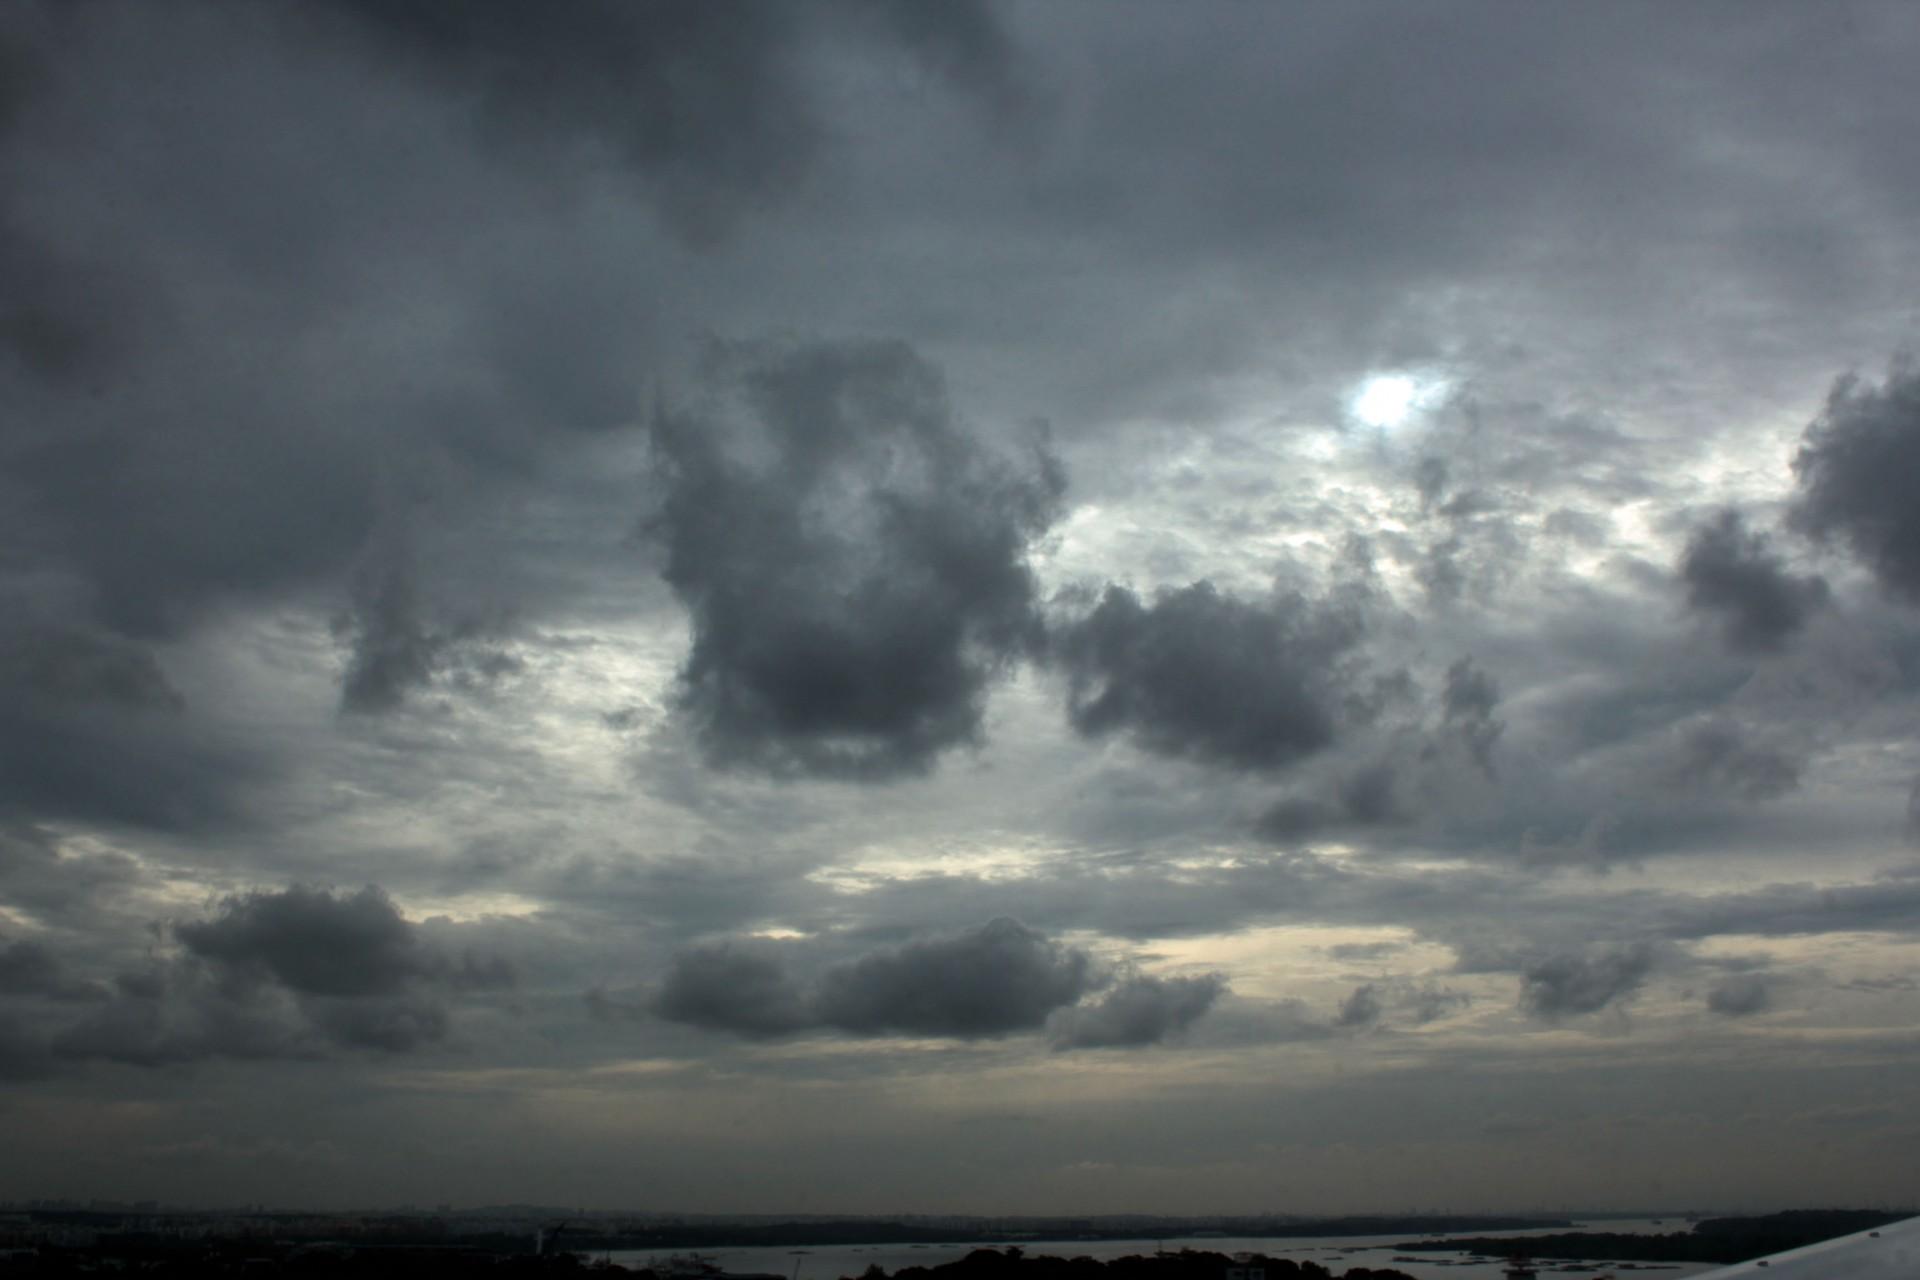 Gloomy Fall Wallpaper Free Photo Dark Sky Storm Stormy Thunderstorm Free